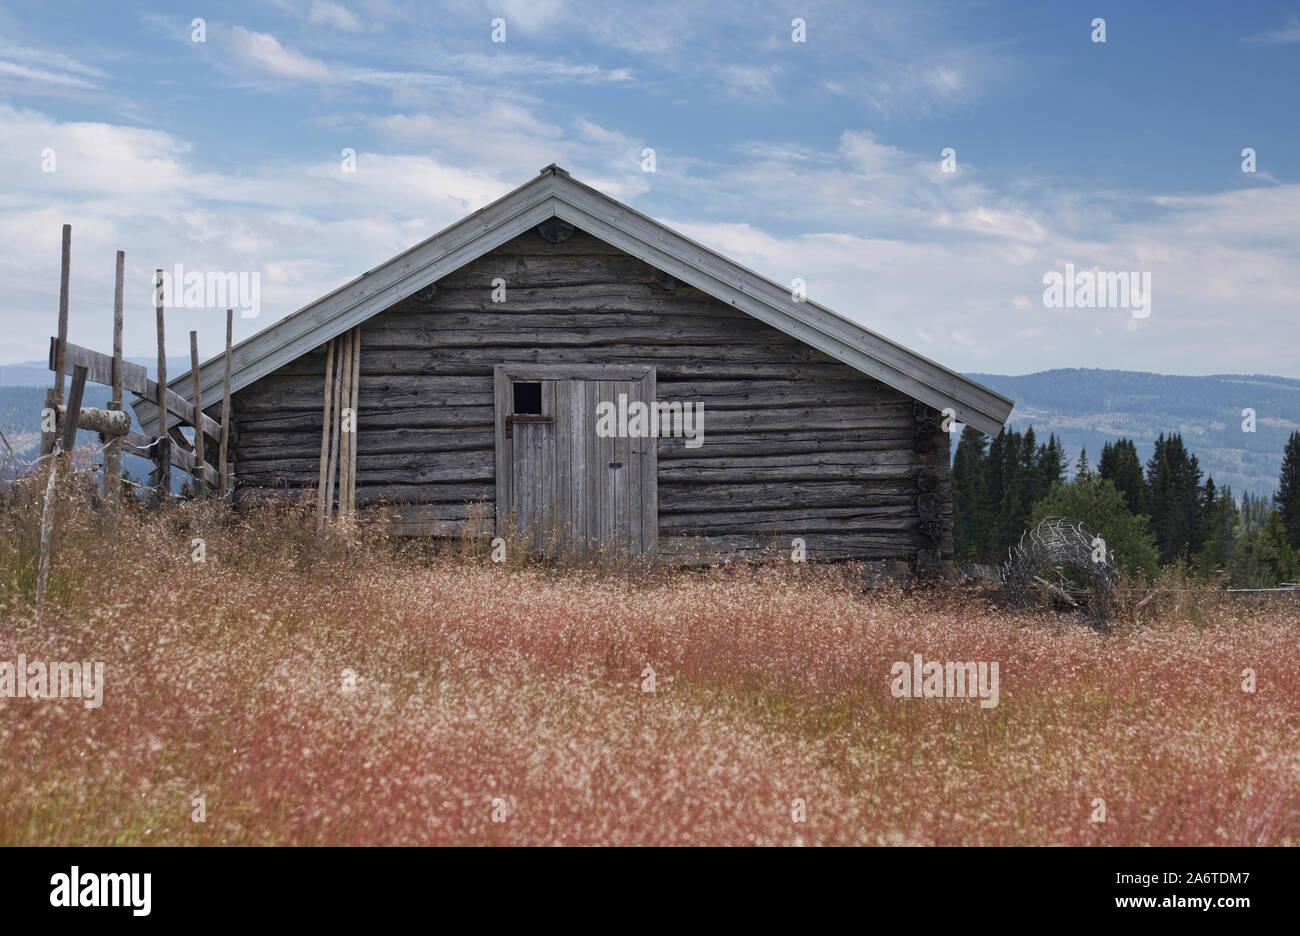 Old barn, shieling, seter, log cabin, Gol, Norway Stock Photo